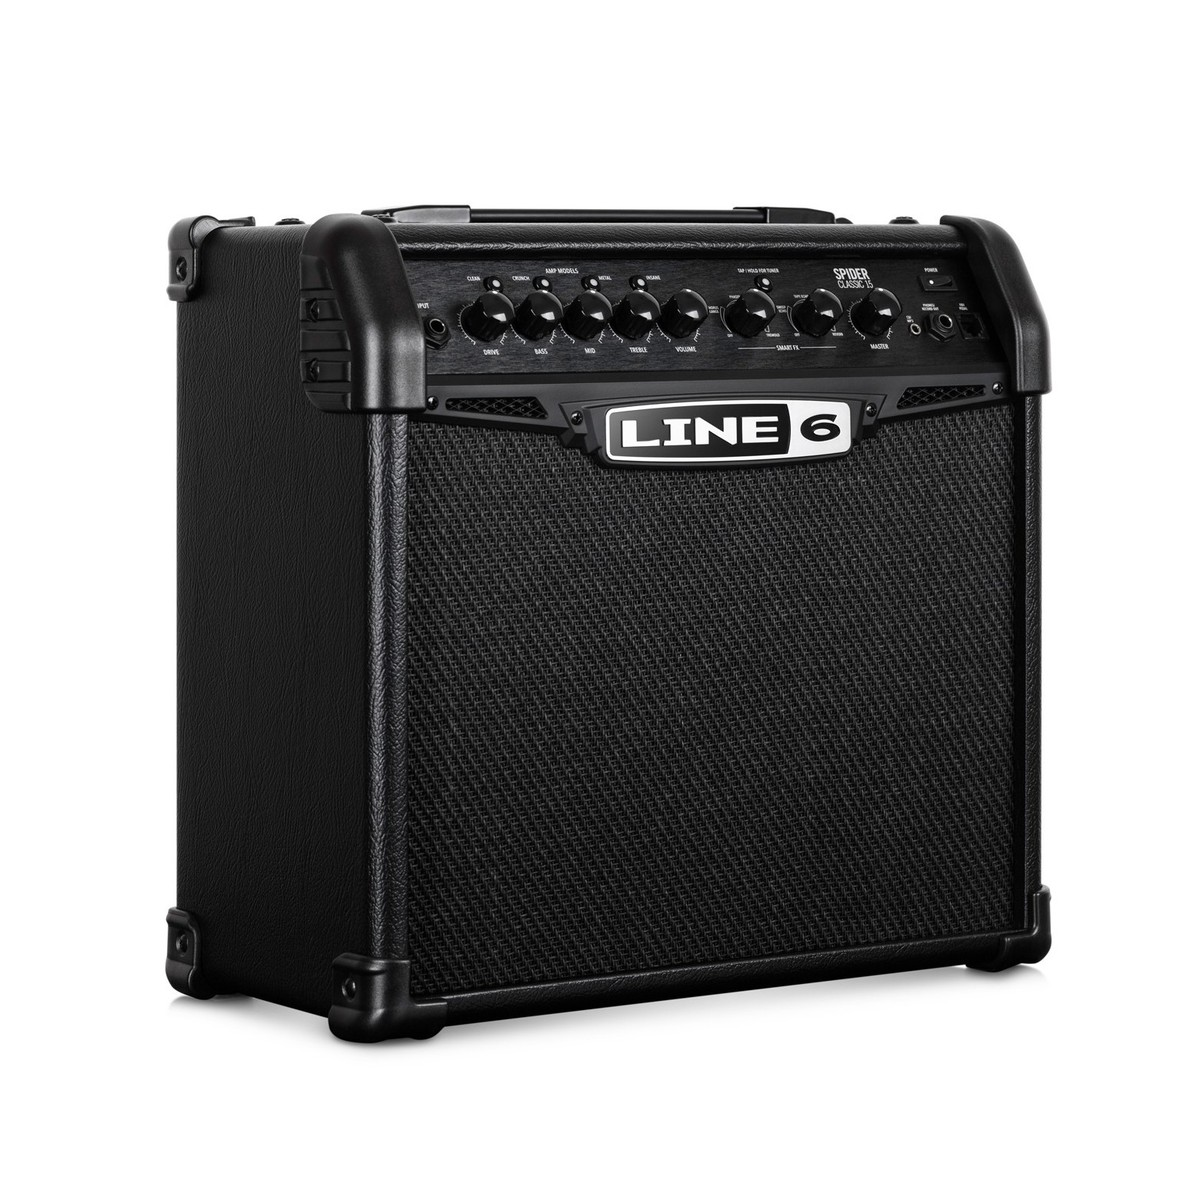 Line 6 Spider Classic V 15, 15 Watt Electric Guitar Amplifier